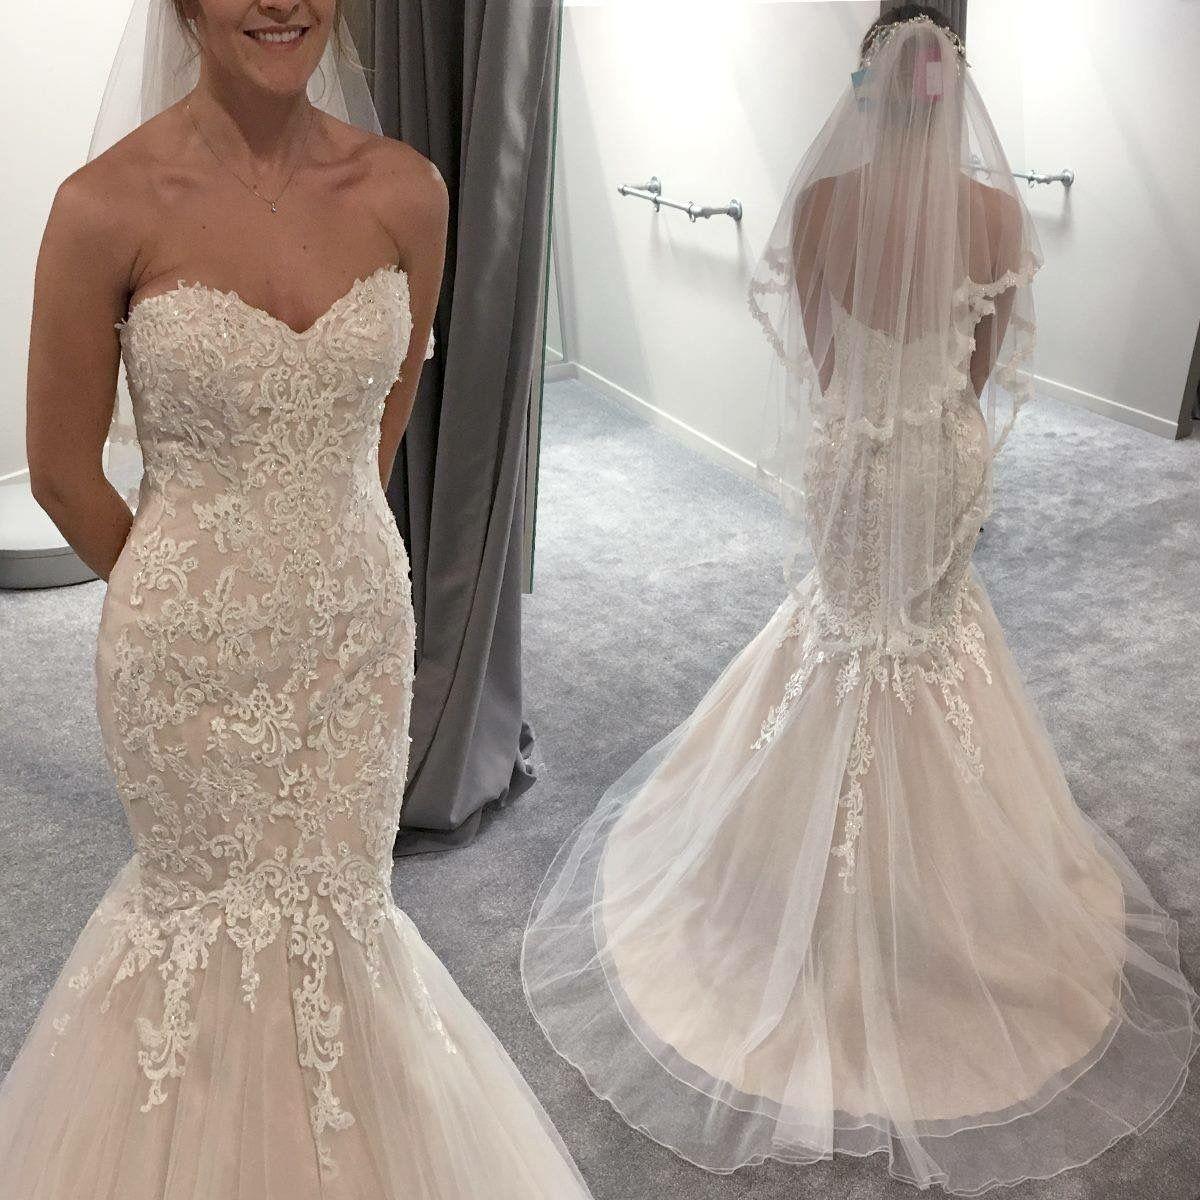 Real Brides Wed2b: Wedding Dresses In 2019